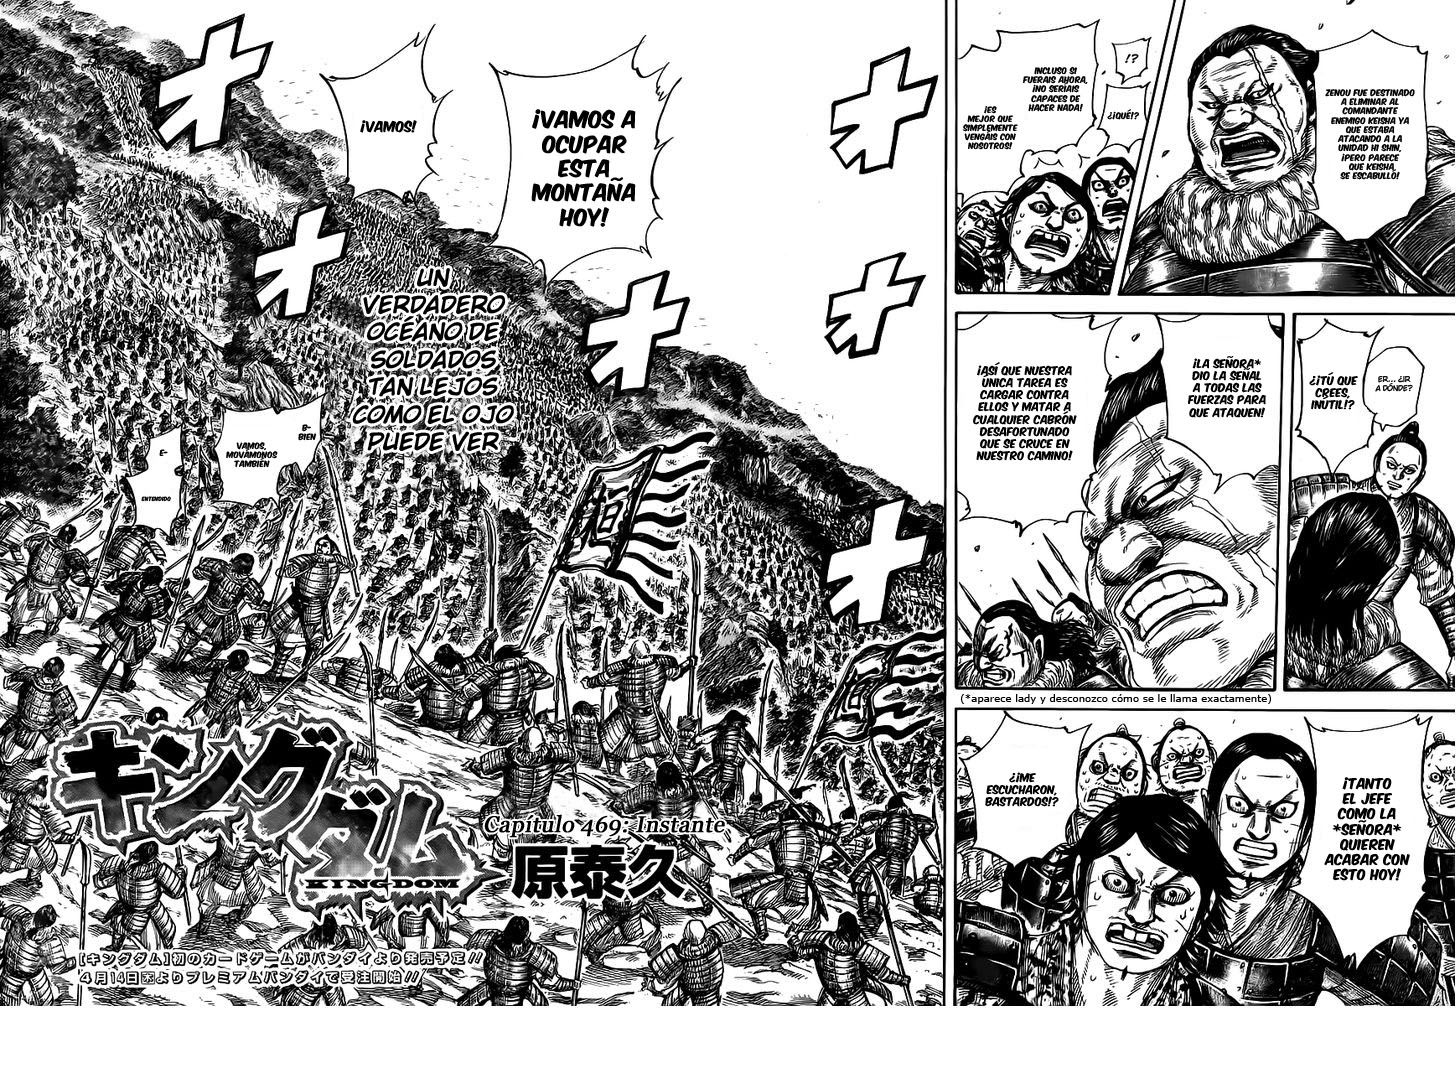 http://c5.ninemanga.com/es_manga/19/12307/458593/f037f3c3ae59cd2f7d5e4f1afef1e95e.jpg Page 4